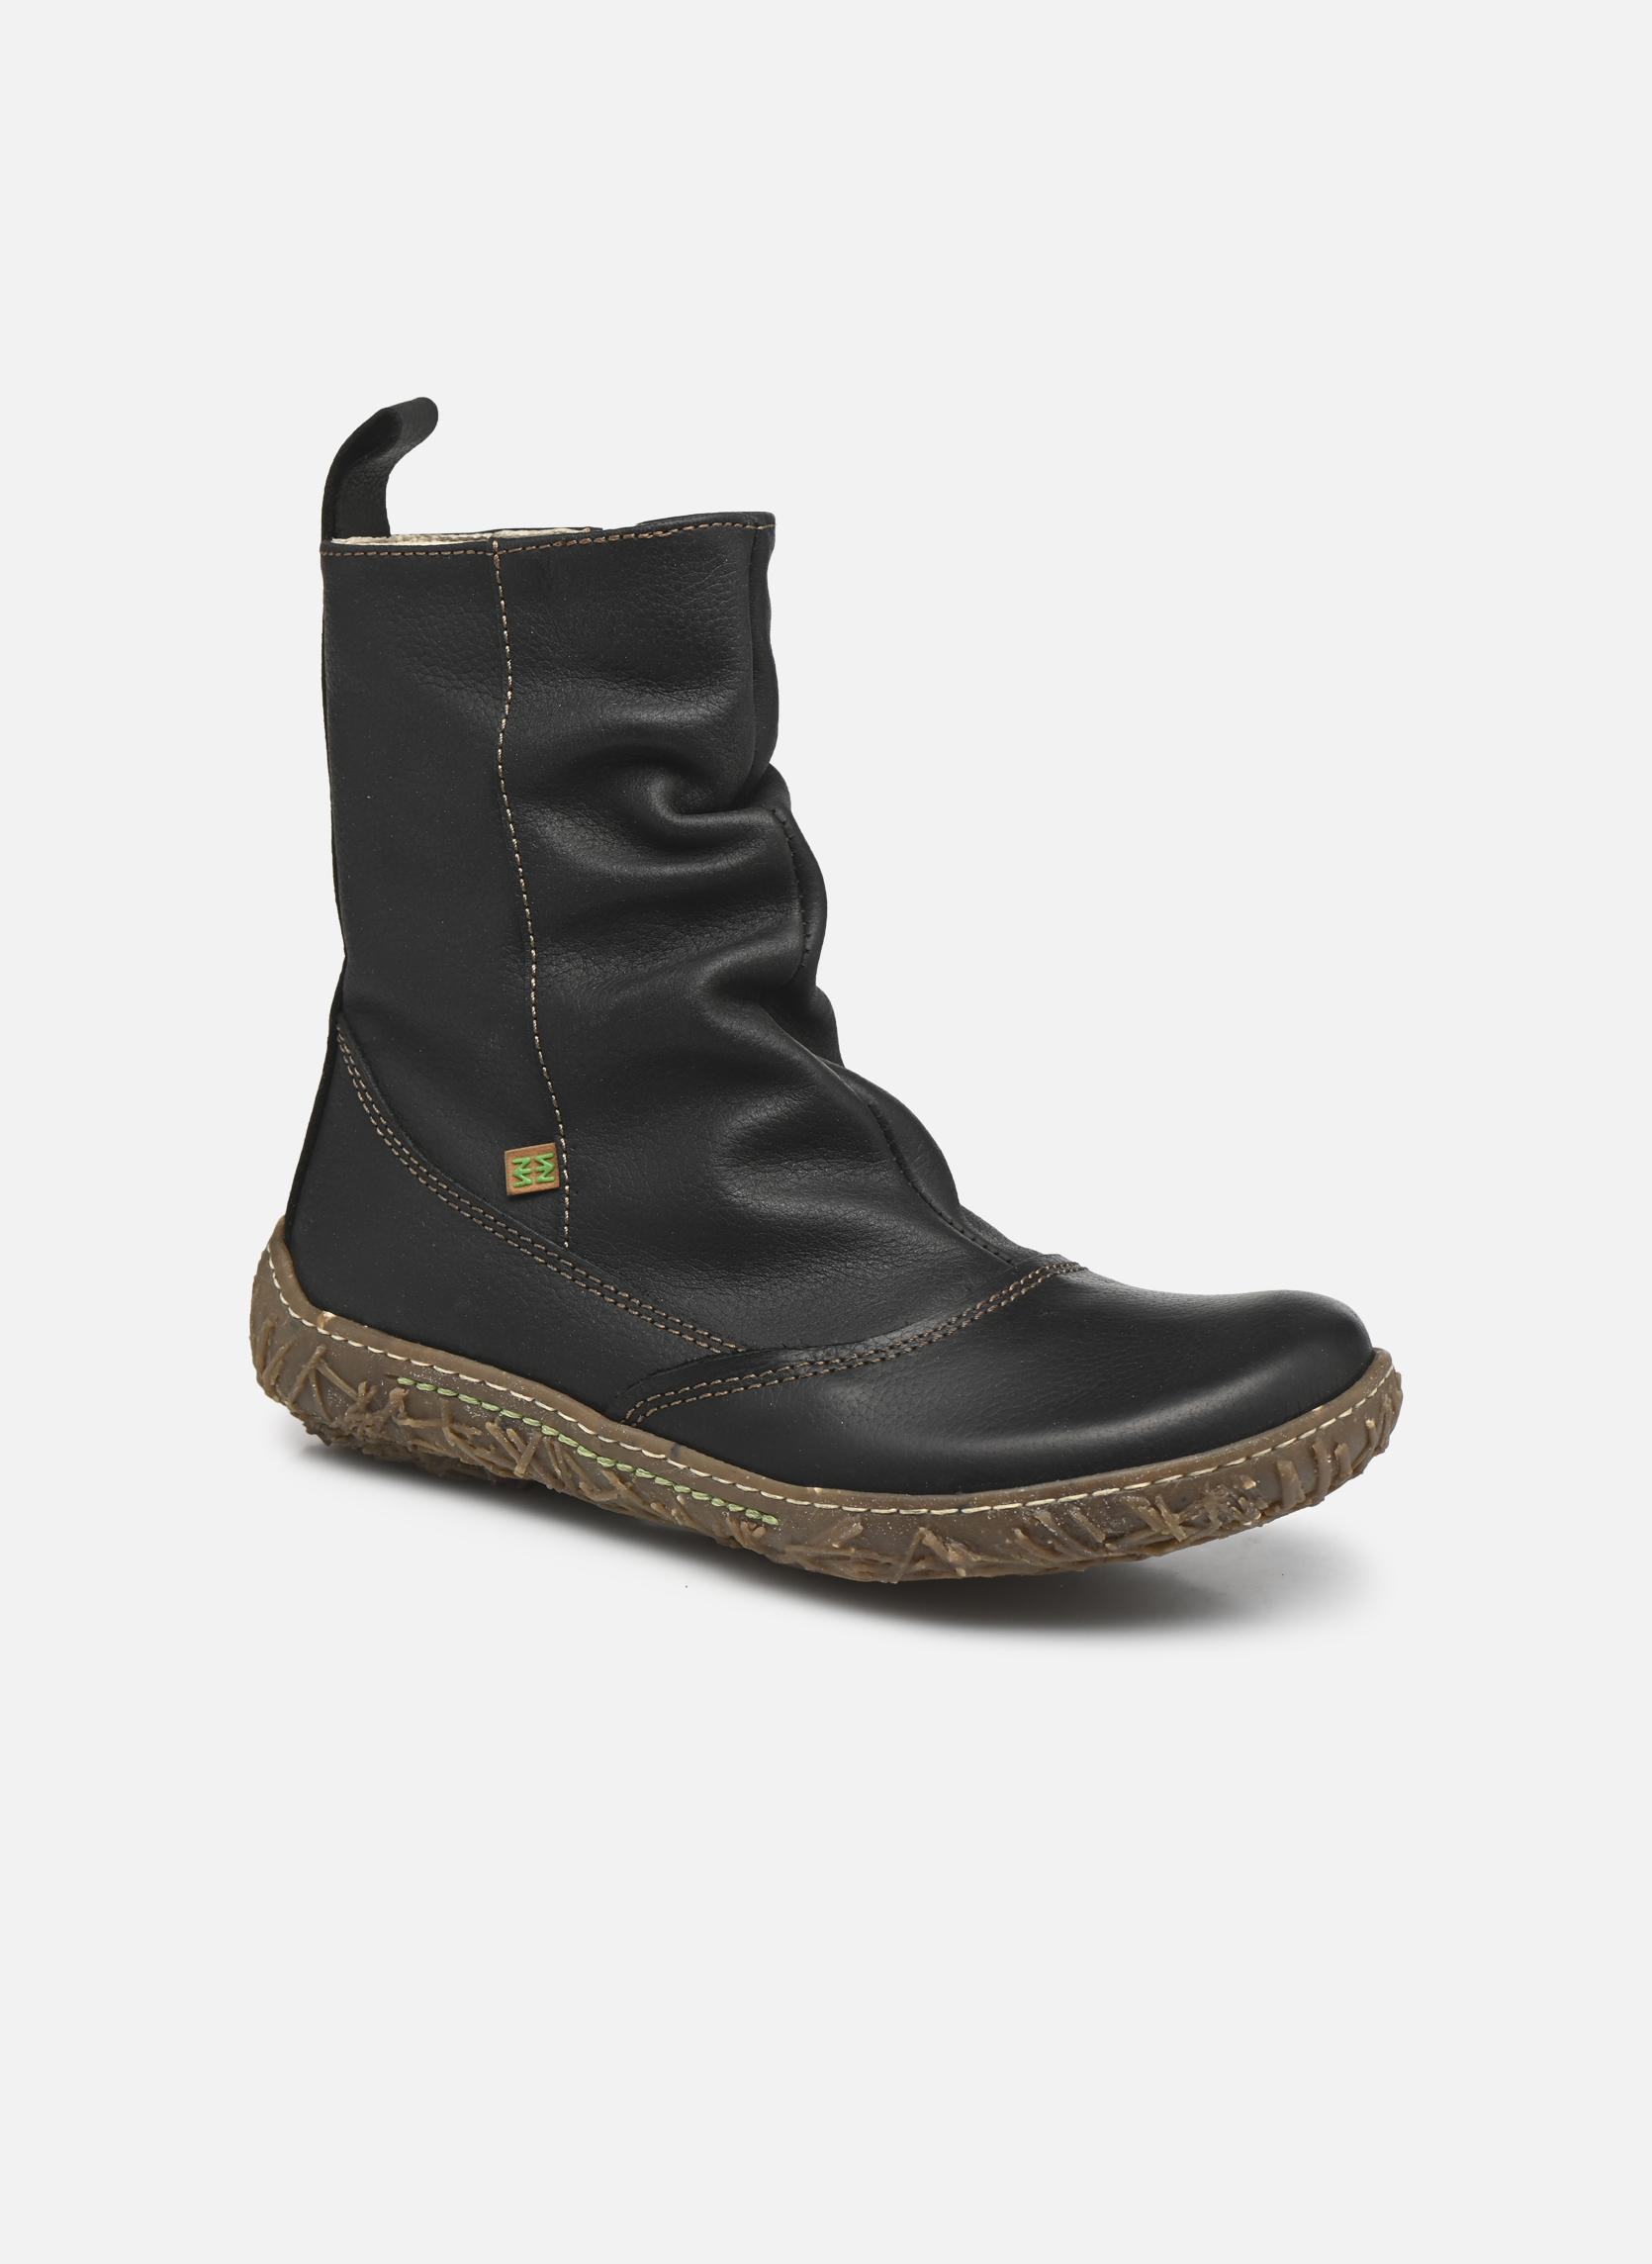 Nido Ella N722 Black soft grain